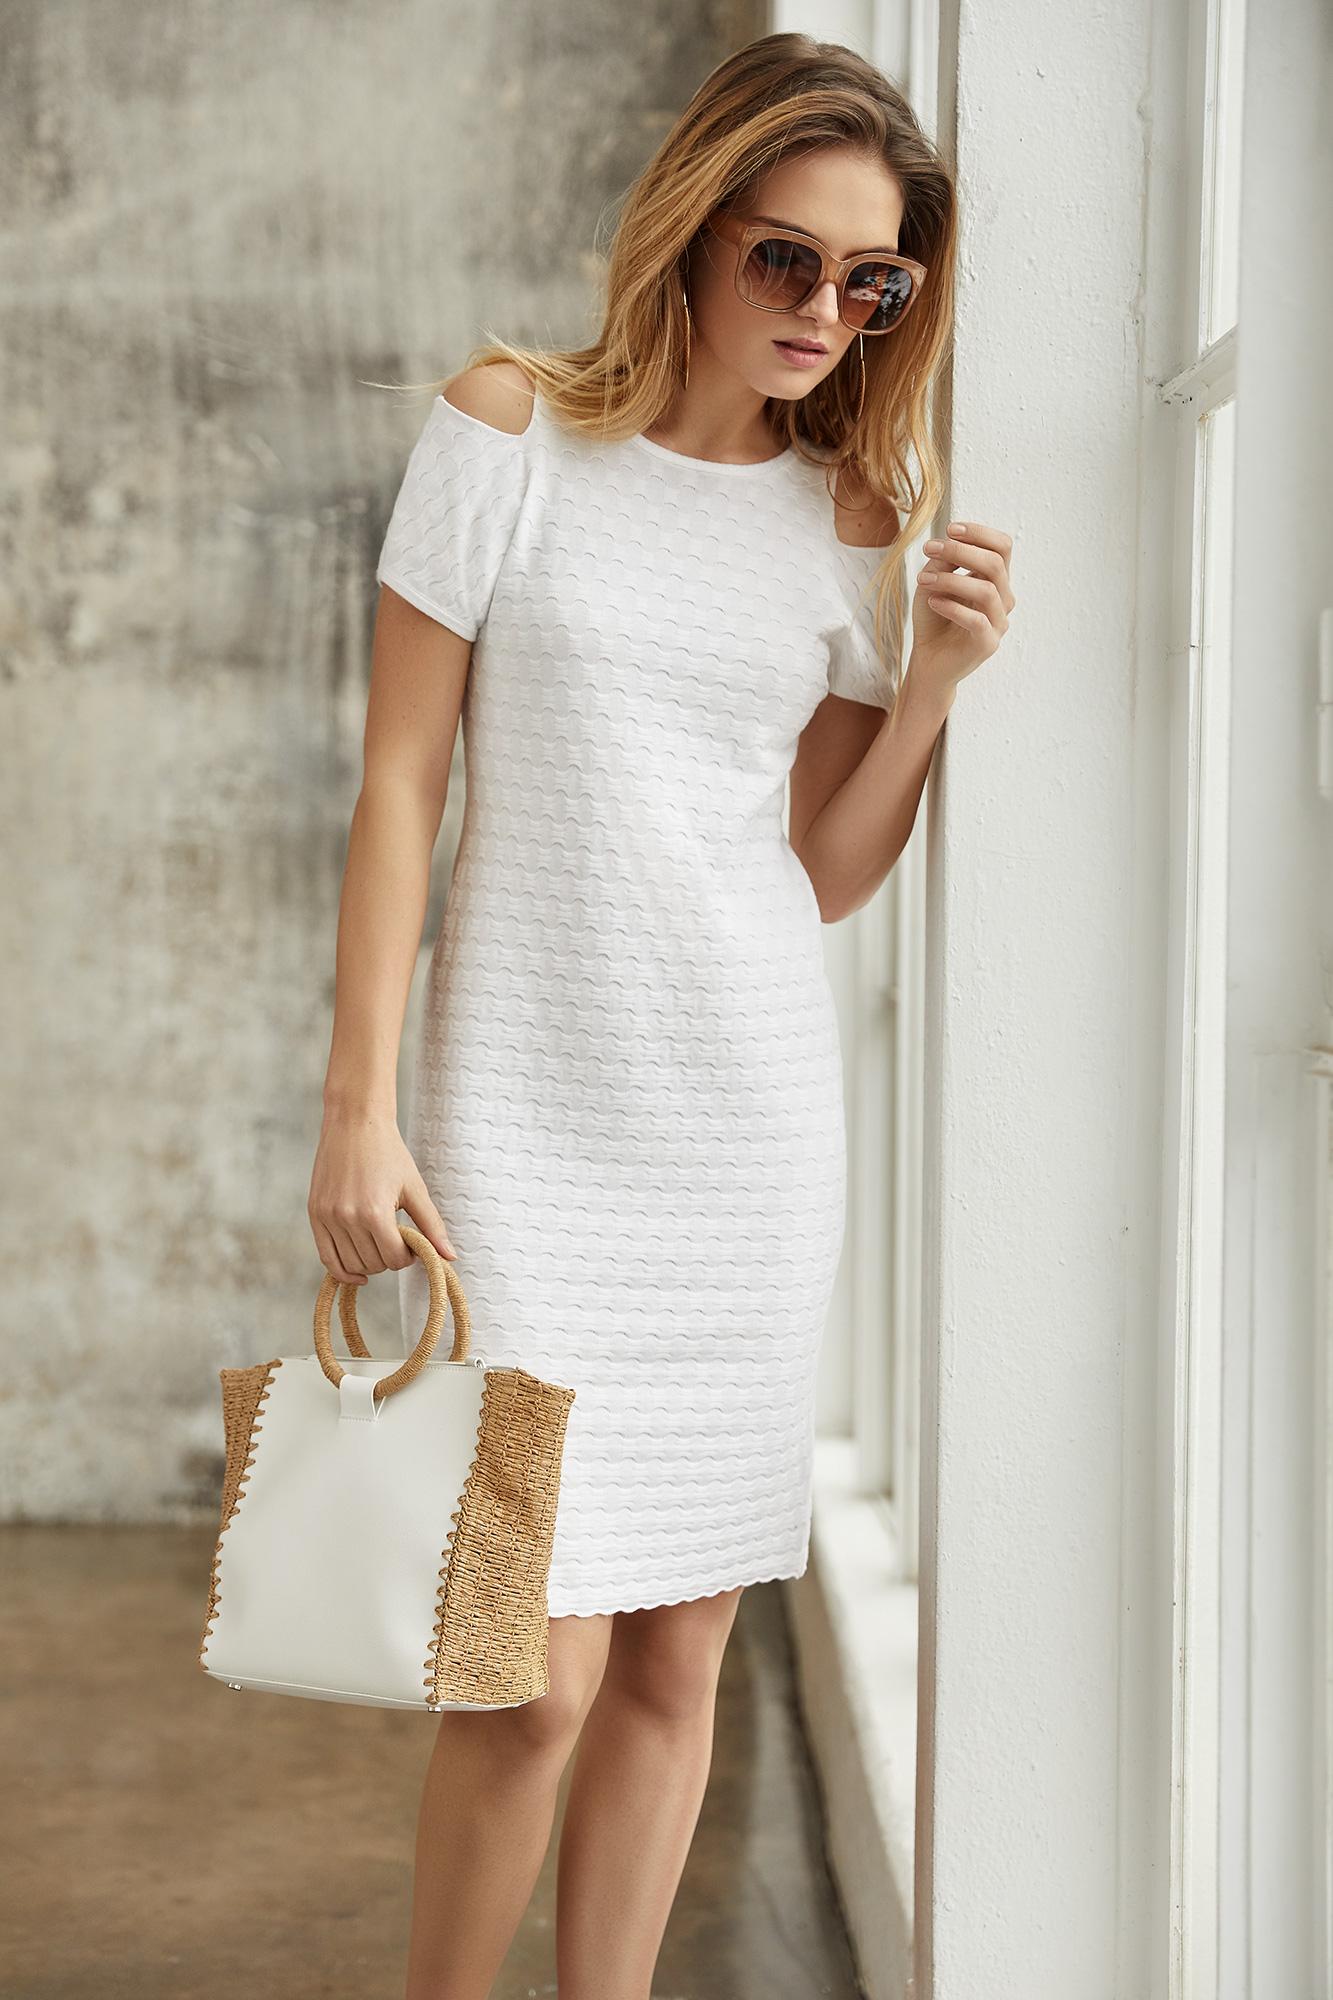 sukienka limosa, biała sukienka, elegancka sukienka, odkryte ramiona